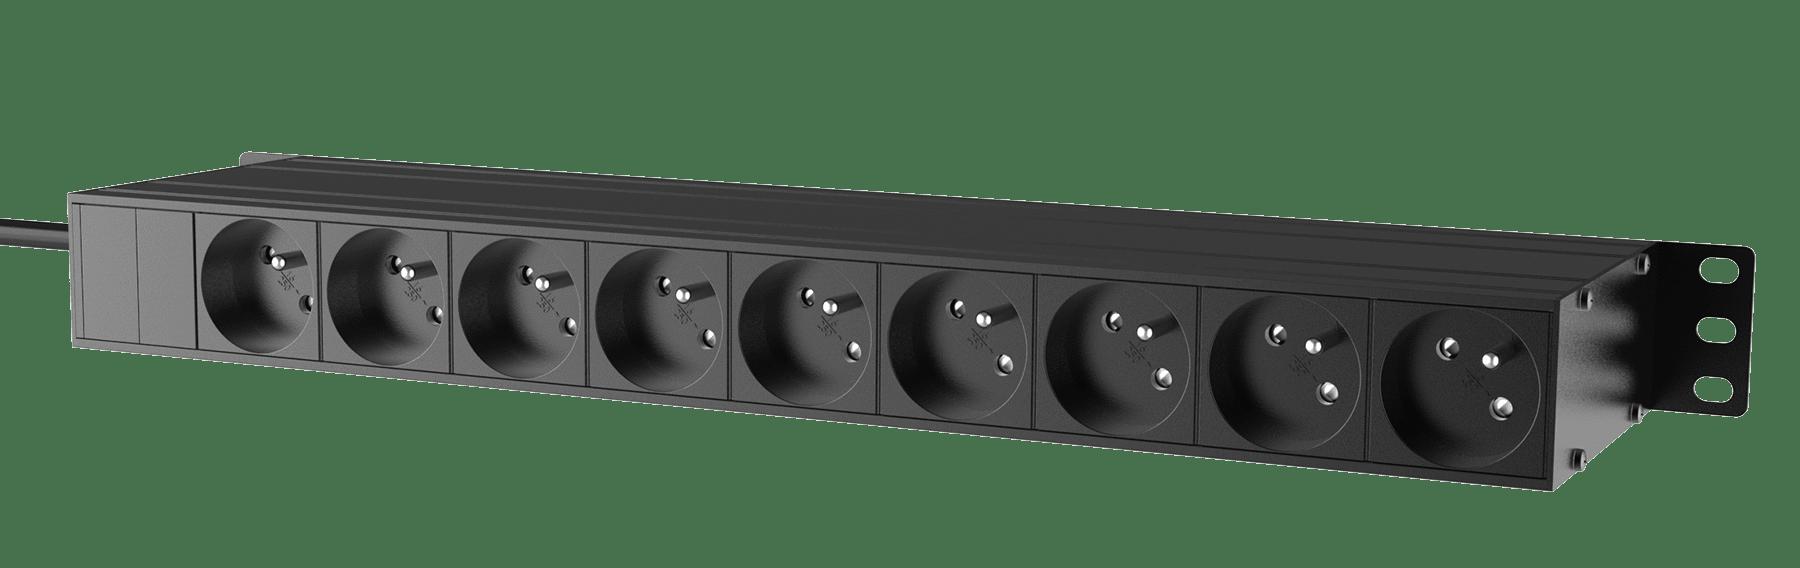 "PSR429F - 19"" power distribution - 9 x French sockets - Light/USB/Fuse"